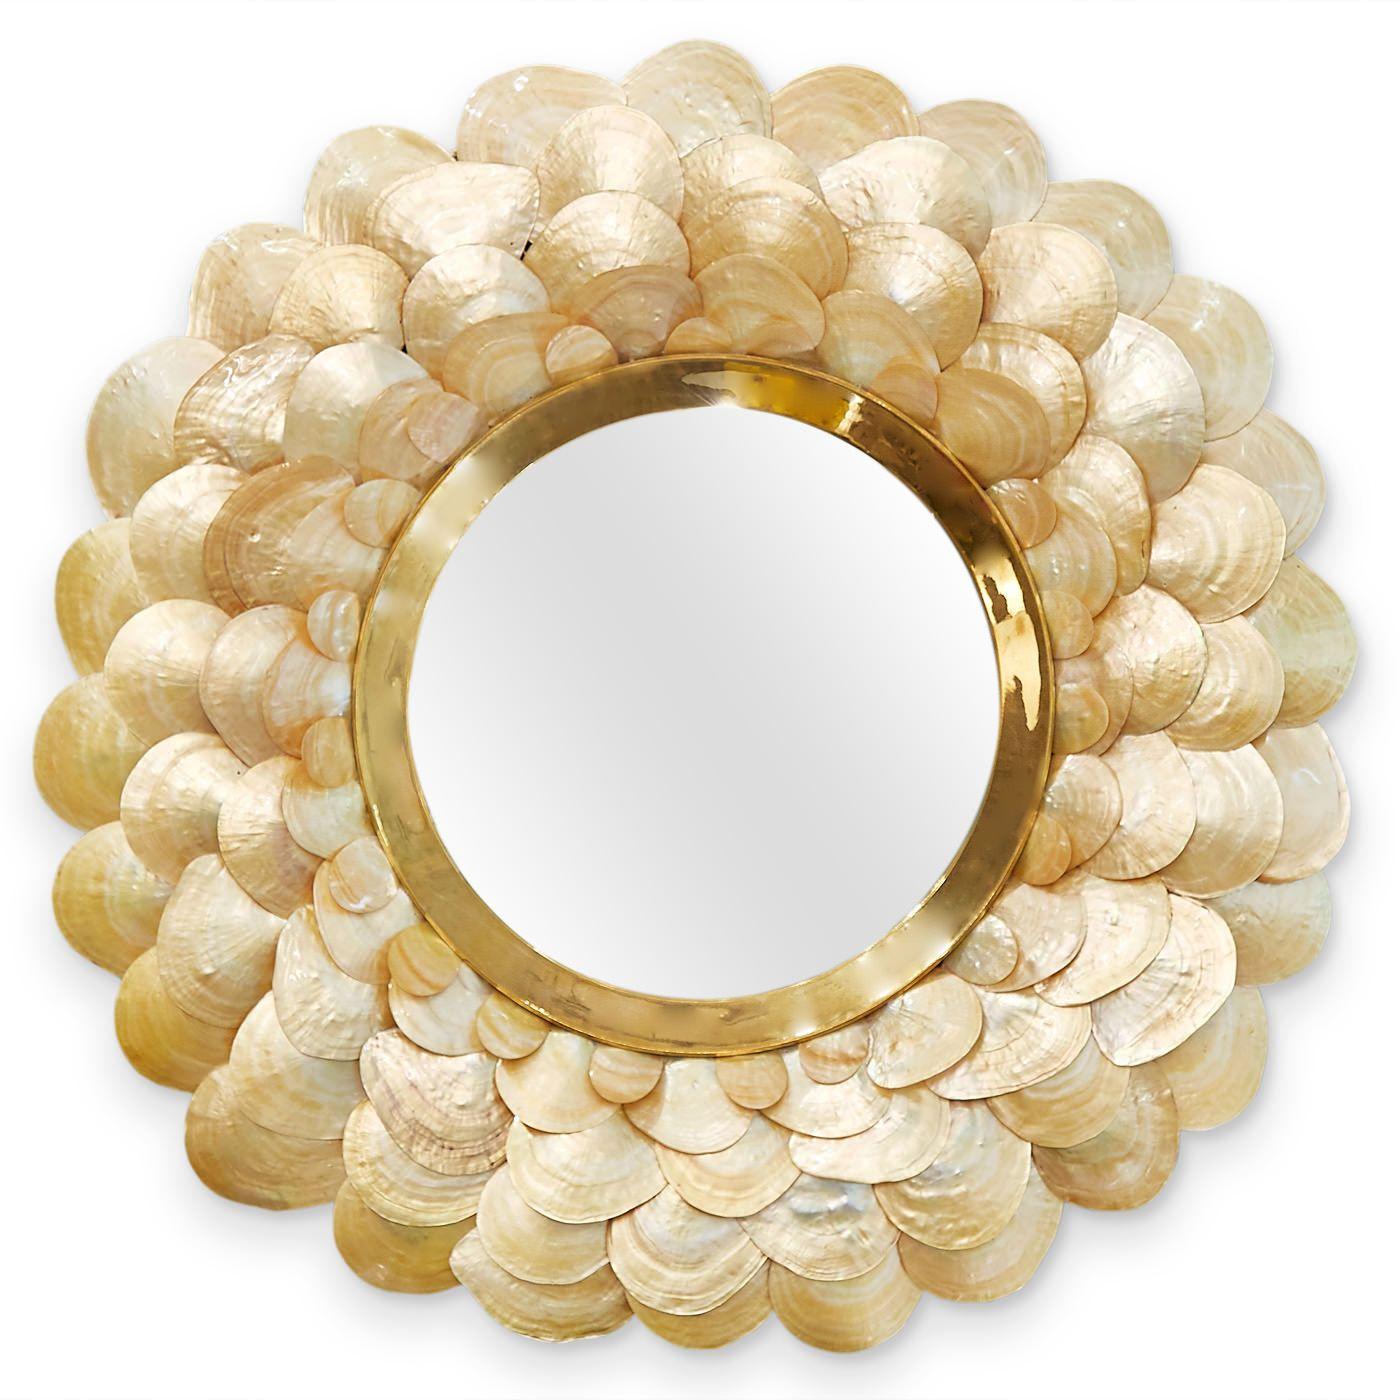 Pin by Tina Herndon on Porthole Mirror | Pinterest | Porthole mirror ...